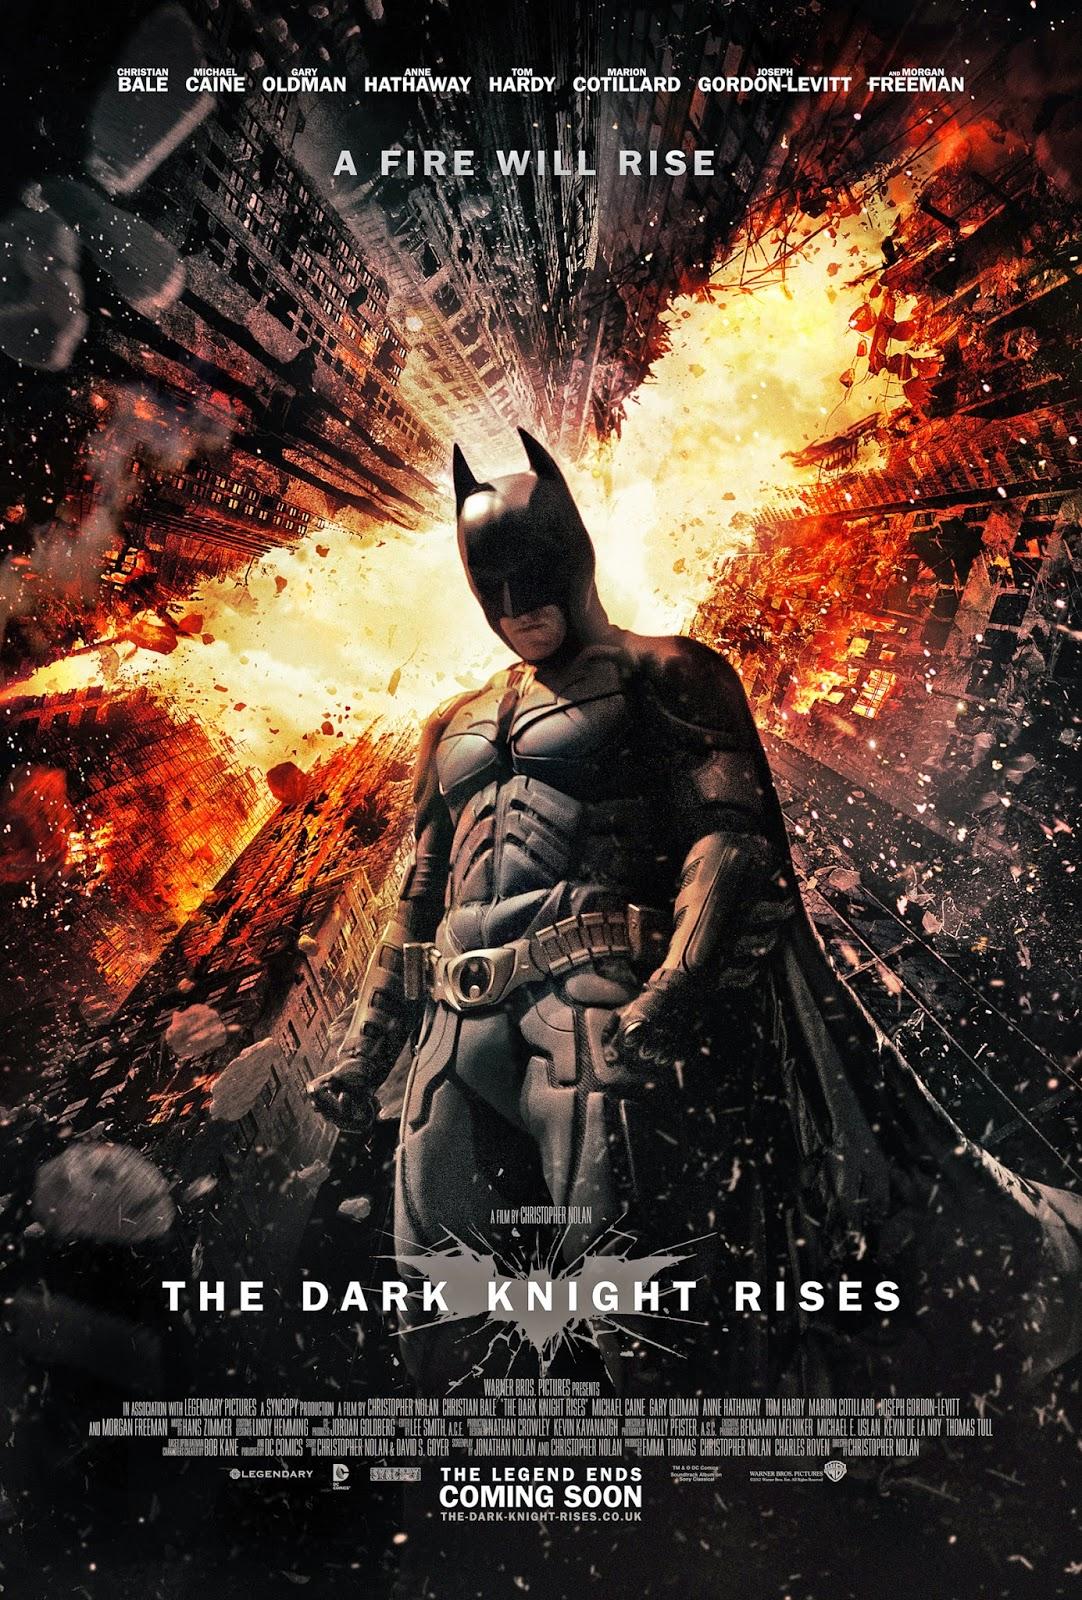 The Dark Knight Rises {1080} (2012) The_Dark_Knight_Rises_poster